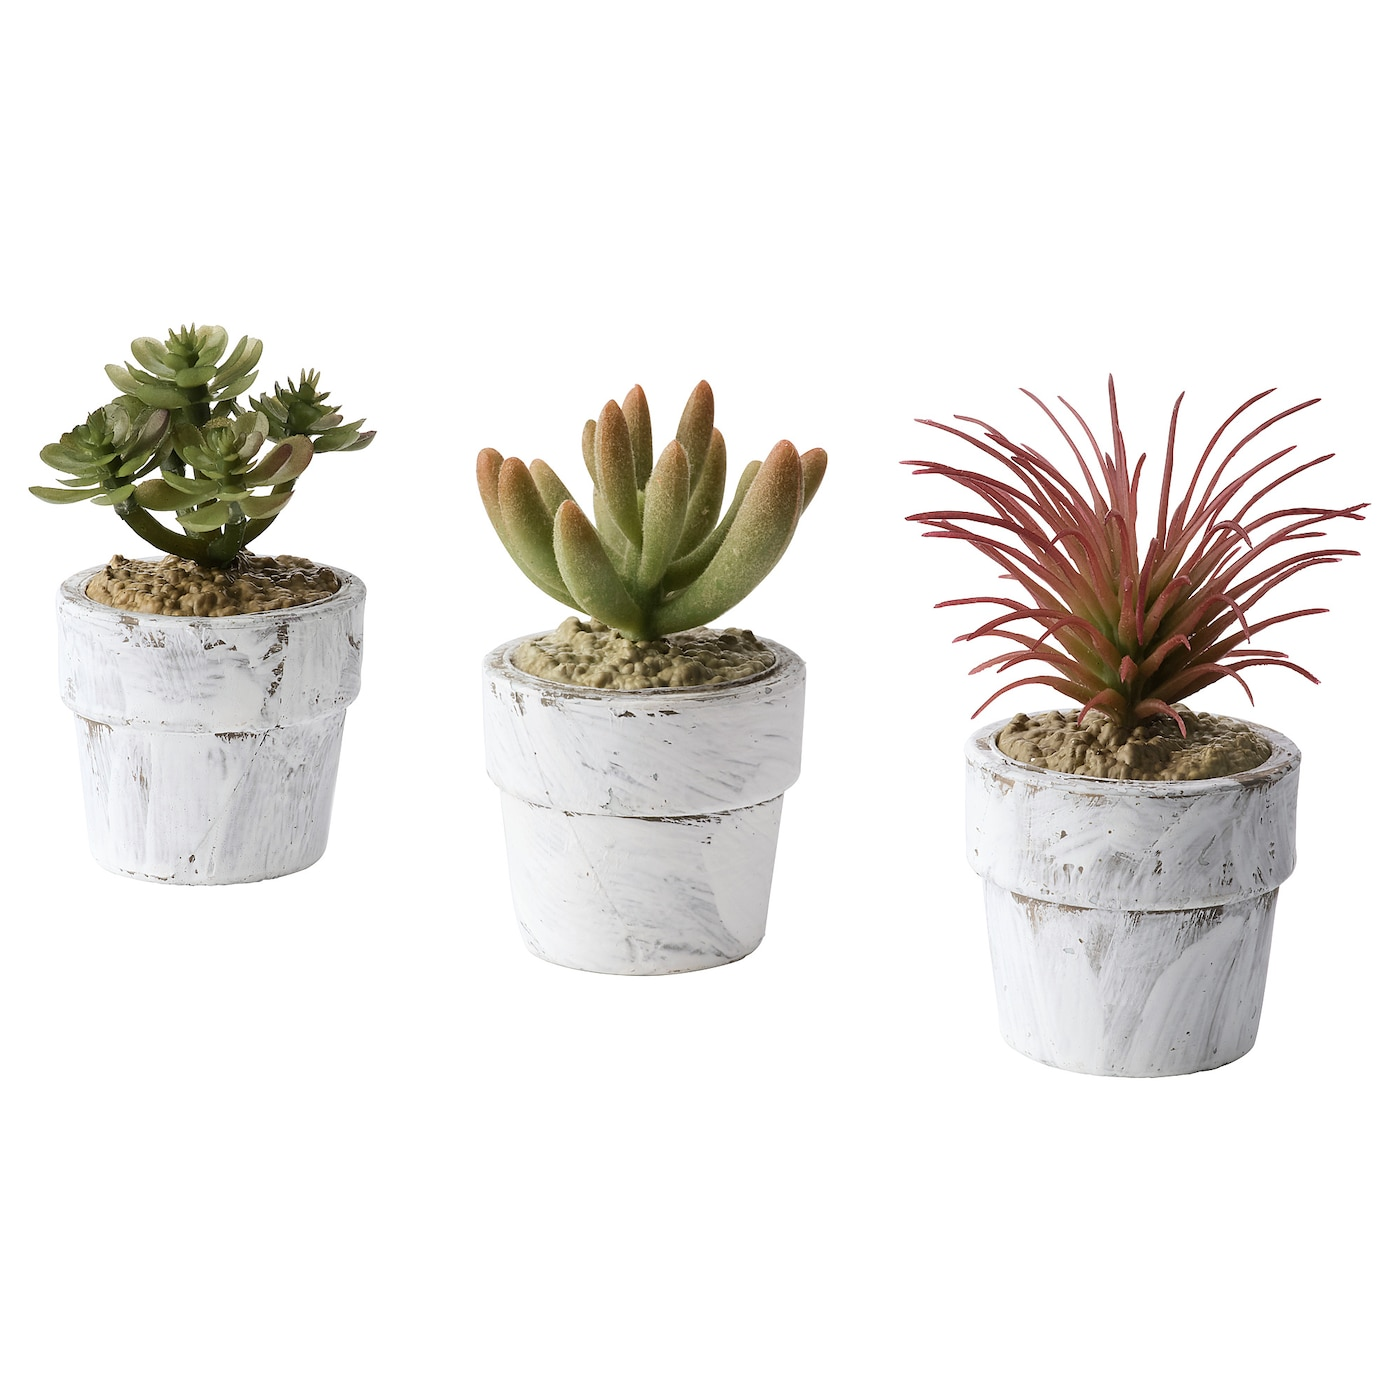 FEJKA Artificial potted plant with pot - indoor/outdoor Succulent - IKEA